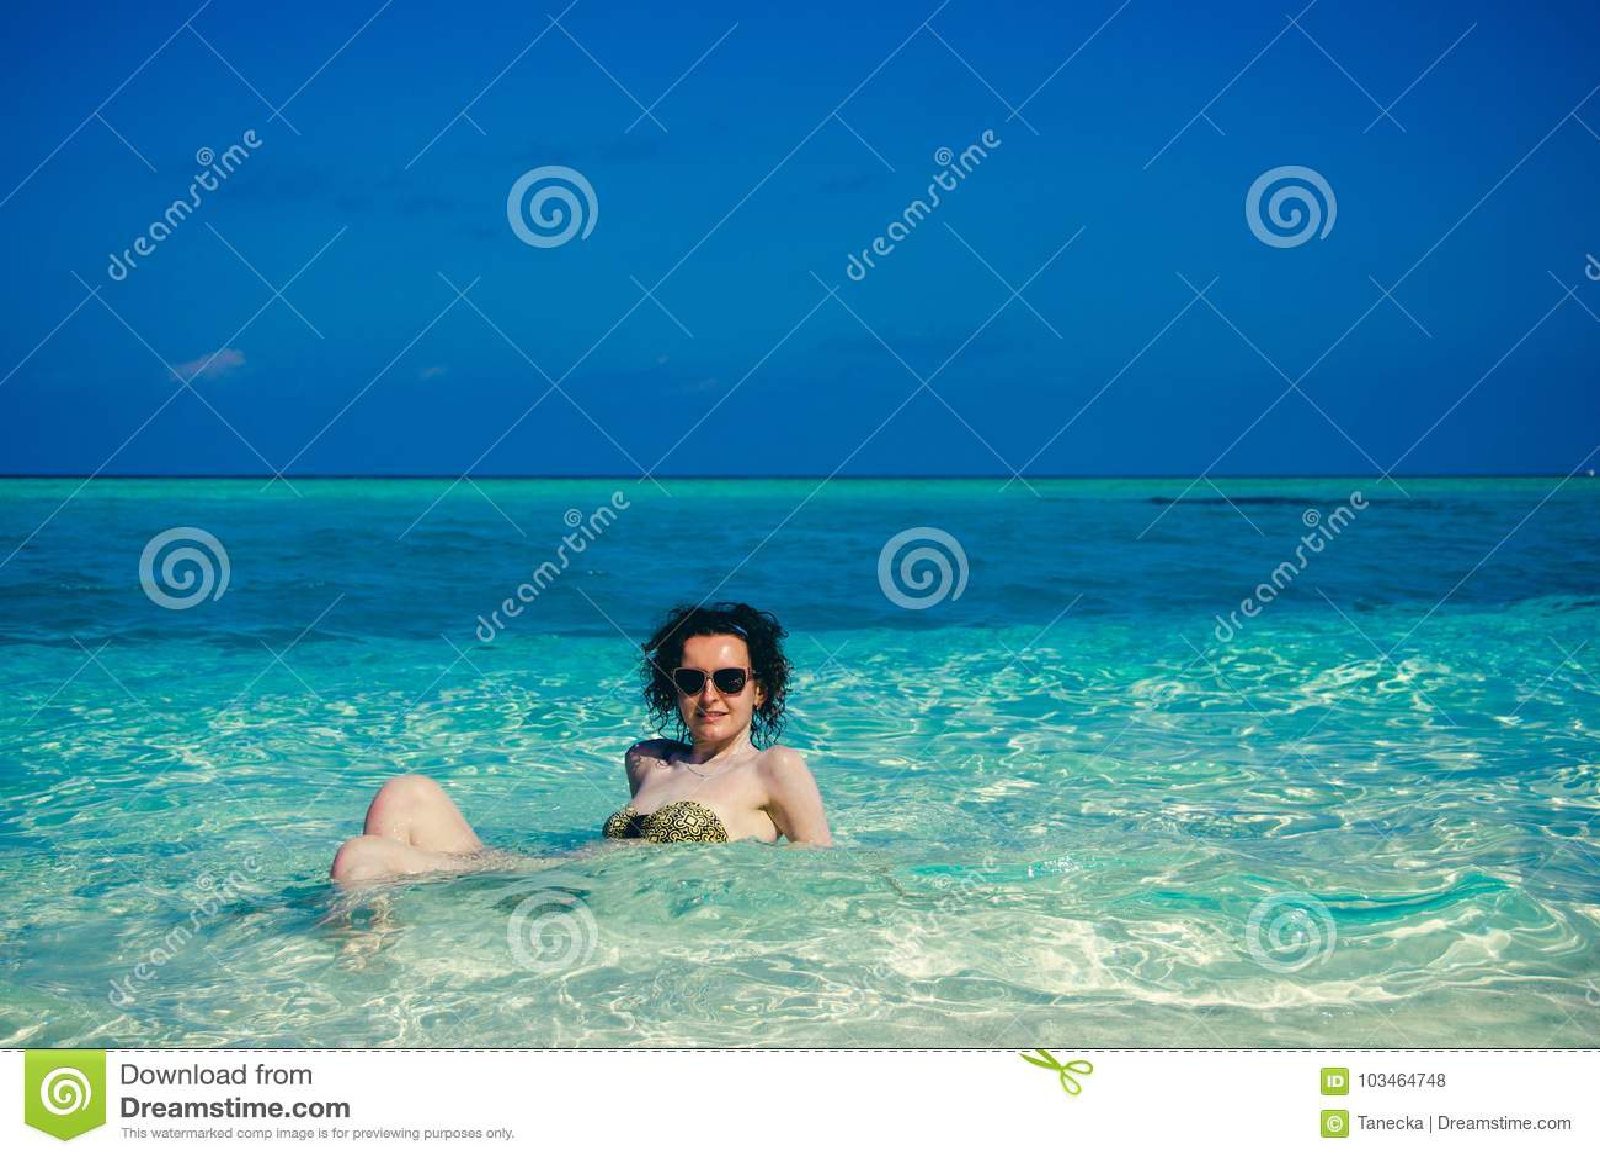 Idyllic paradise island landscape. Exotic tropical beach. Summer vacation, luxury holiday resort, tourism concept. Travel to Maldi